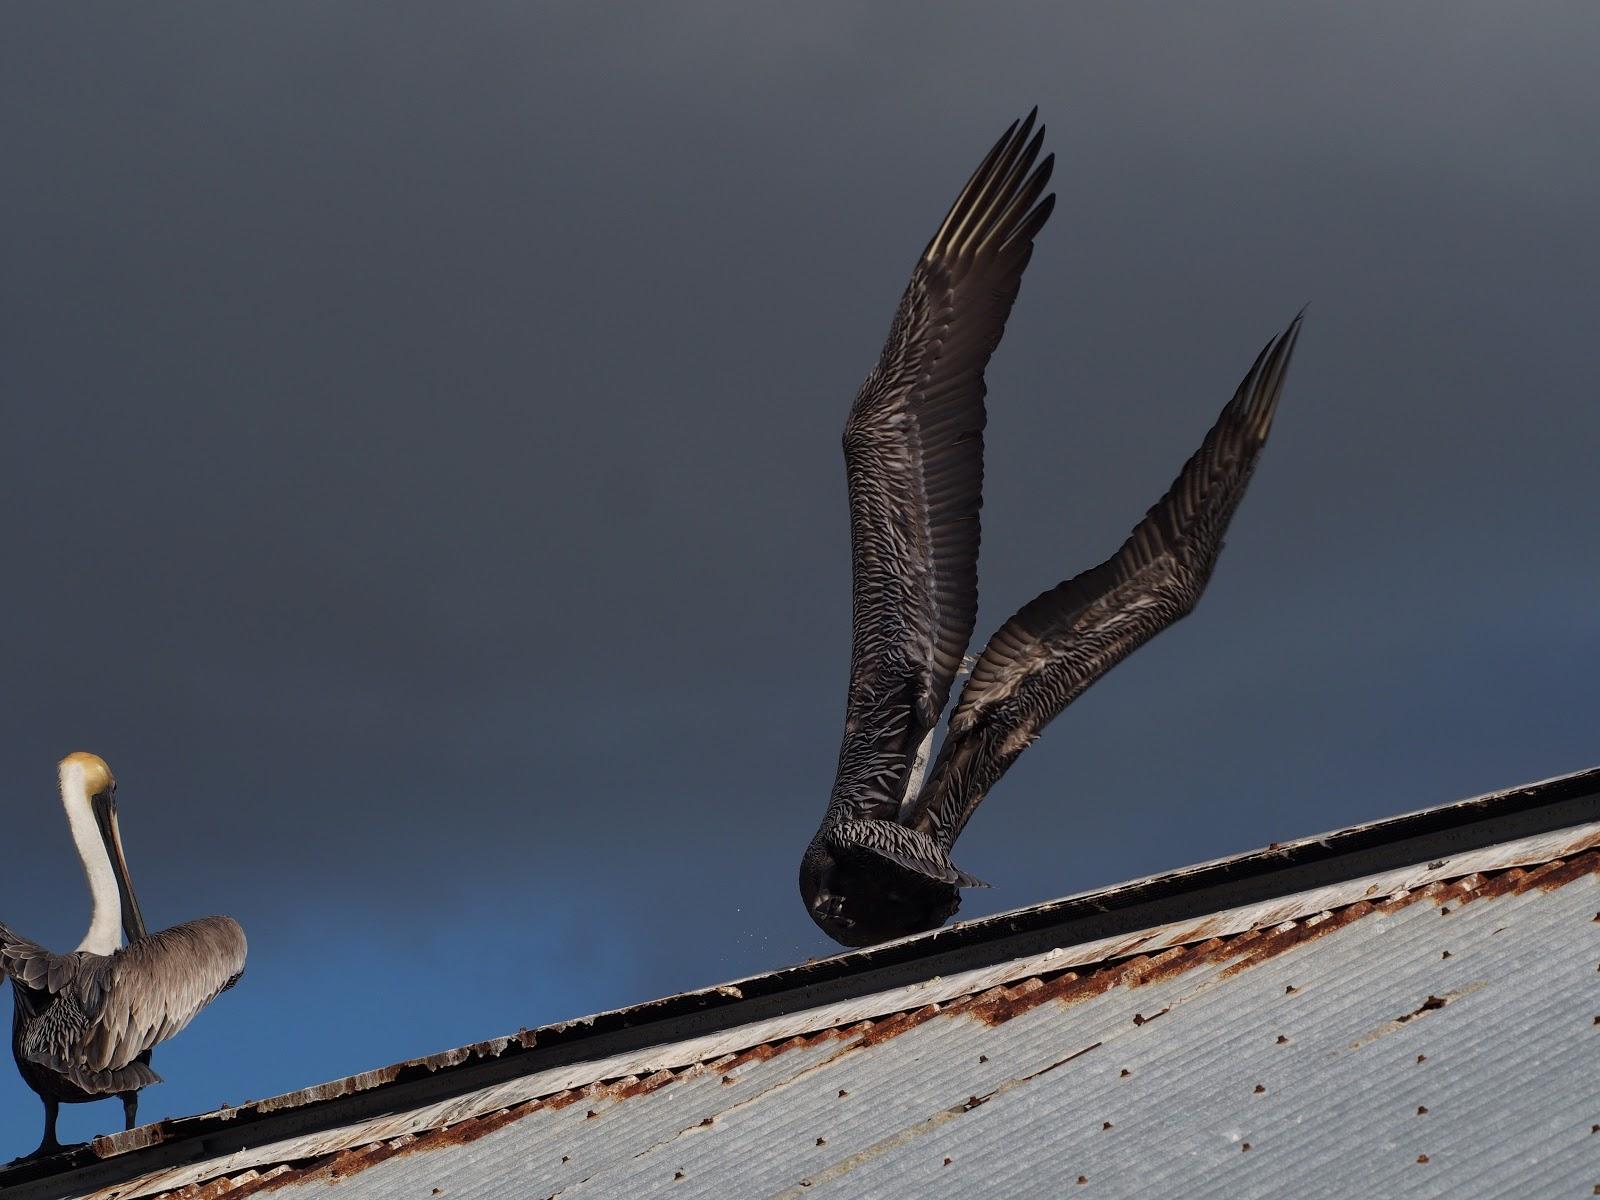 Taking Off, #pelican #pelicans #keywest #florida 2014